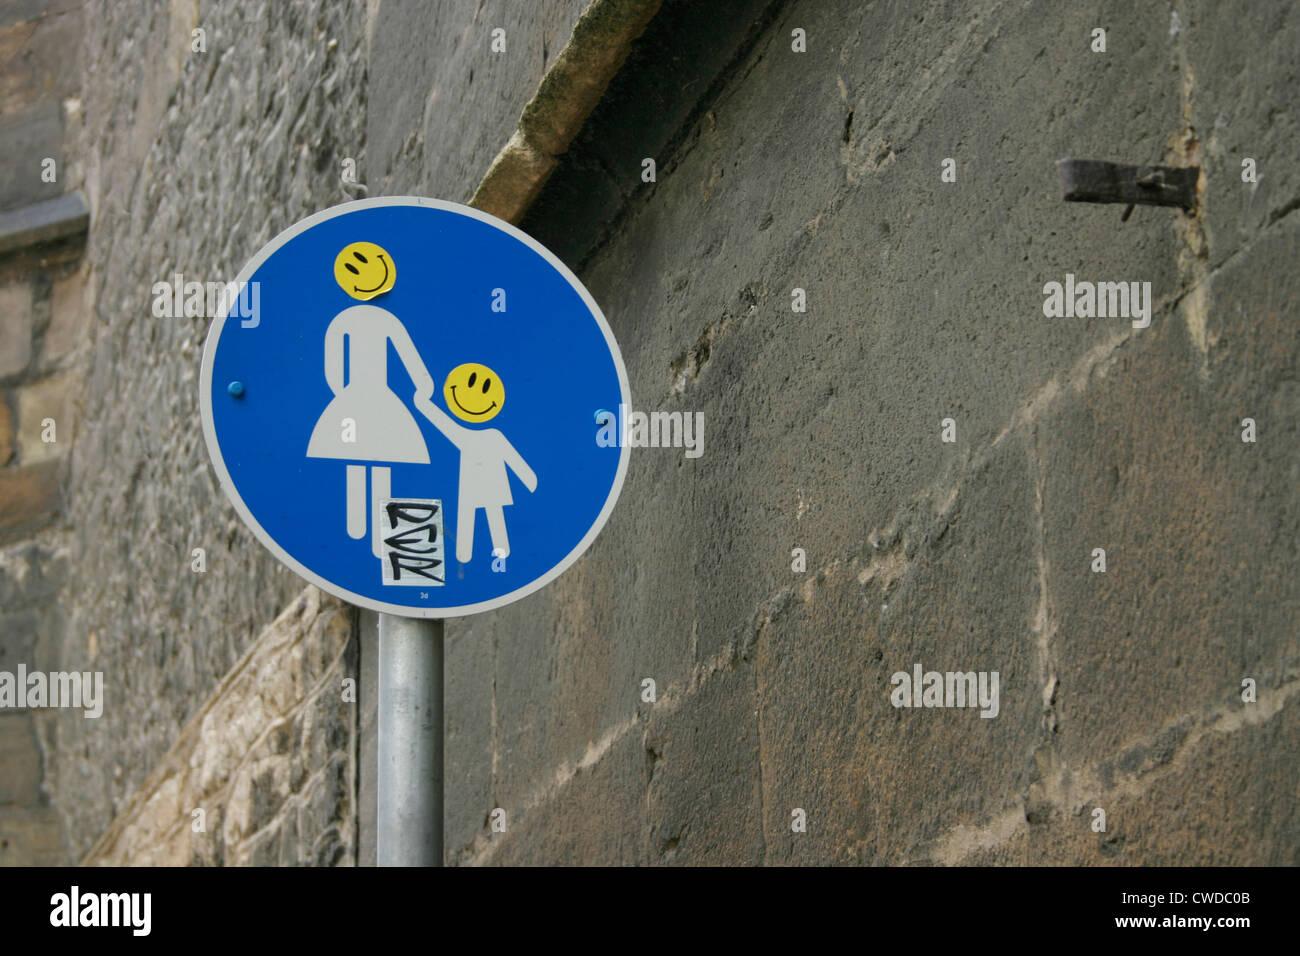 Verkehrszeichen, Smiley, Aufkleber Stockbild